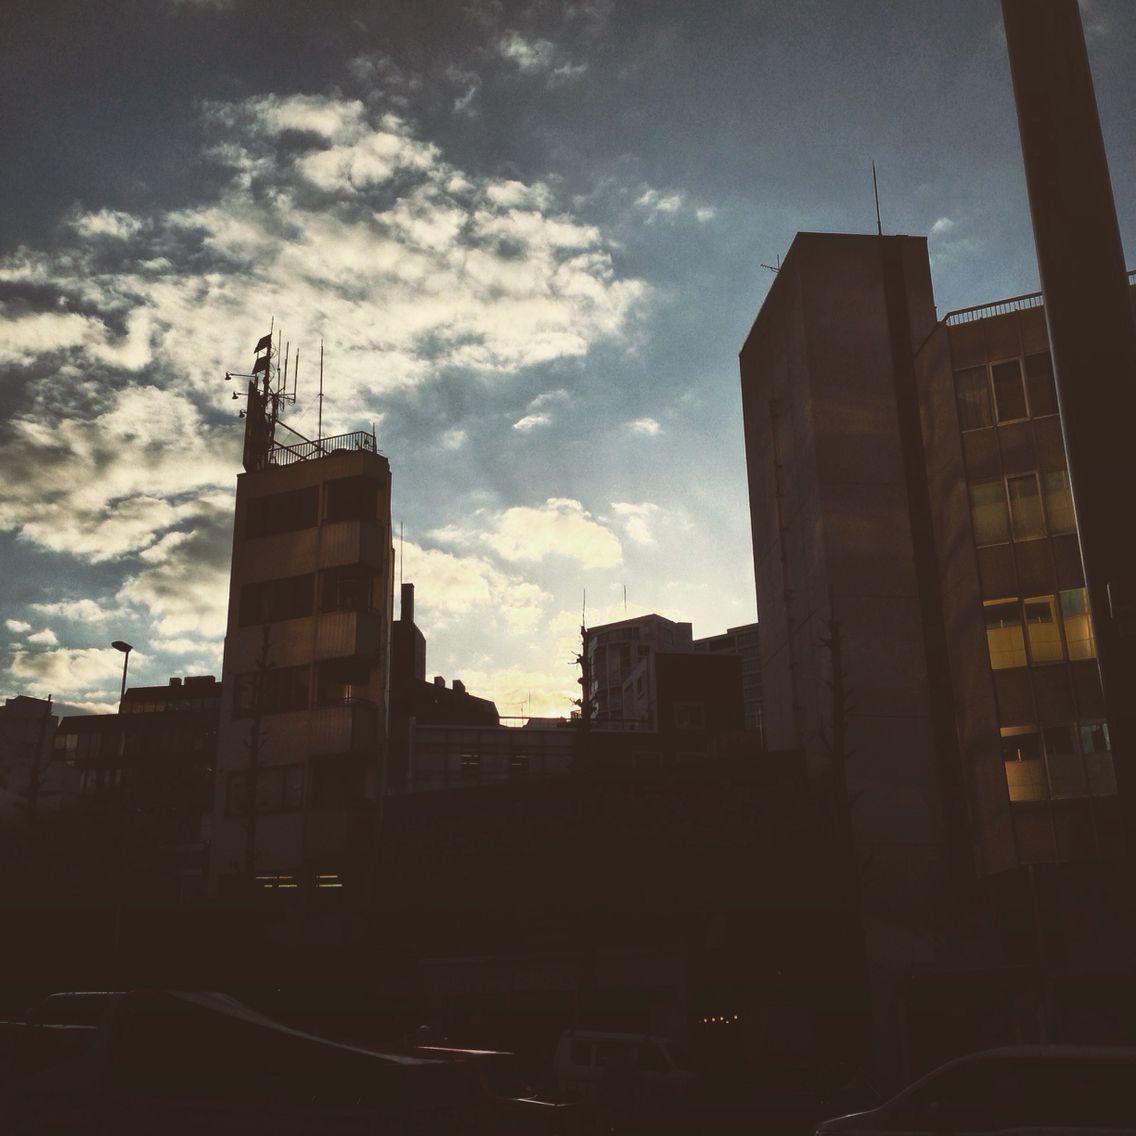 #sunset #building #road #street #tokyo